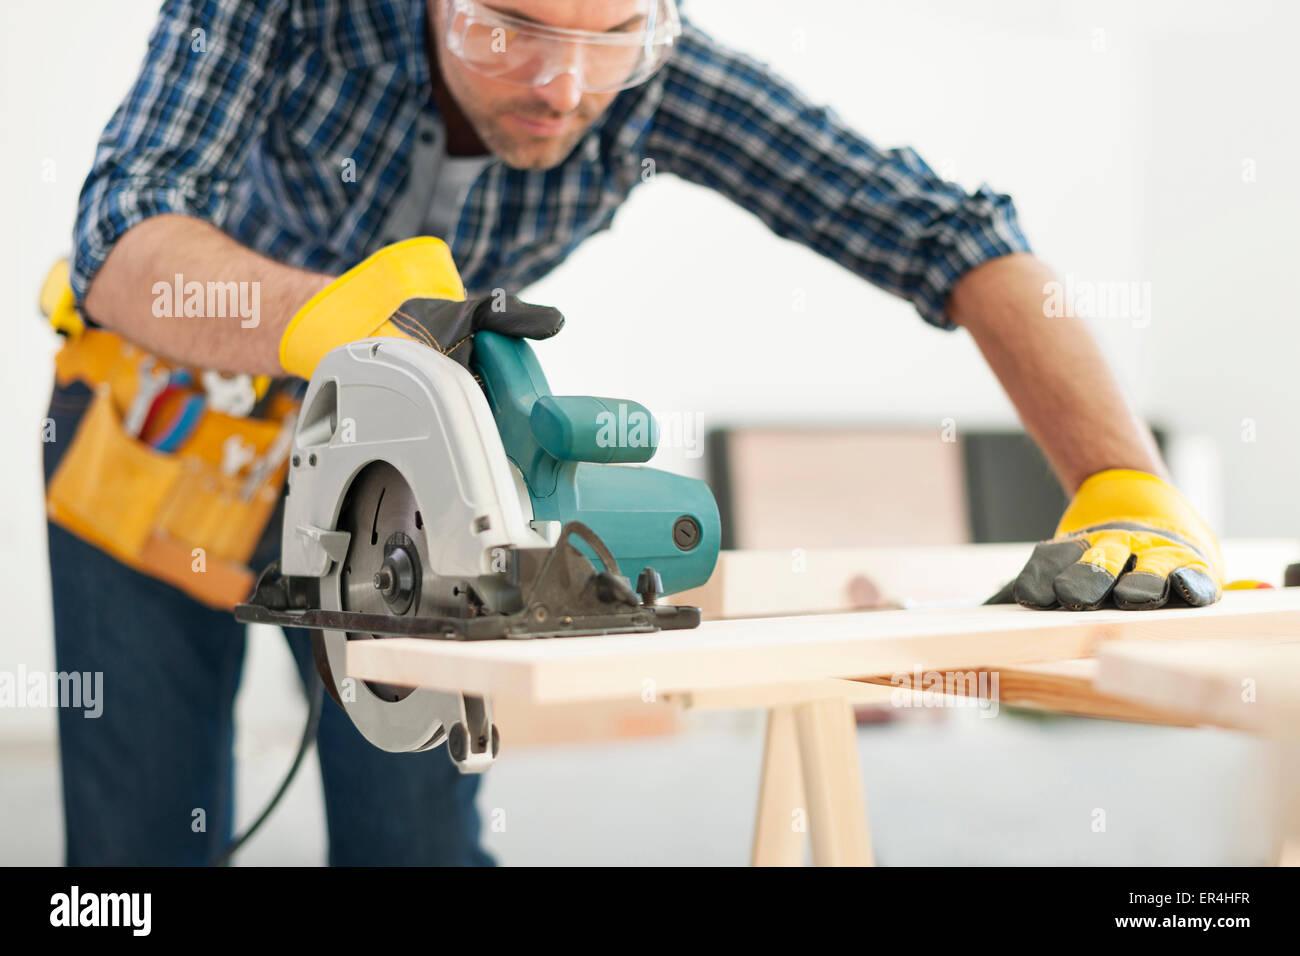 Carpintero trabajando con sierra circular. Pilzno, Polonia Foto de stock